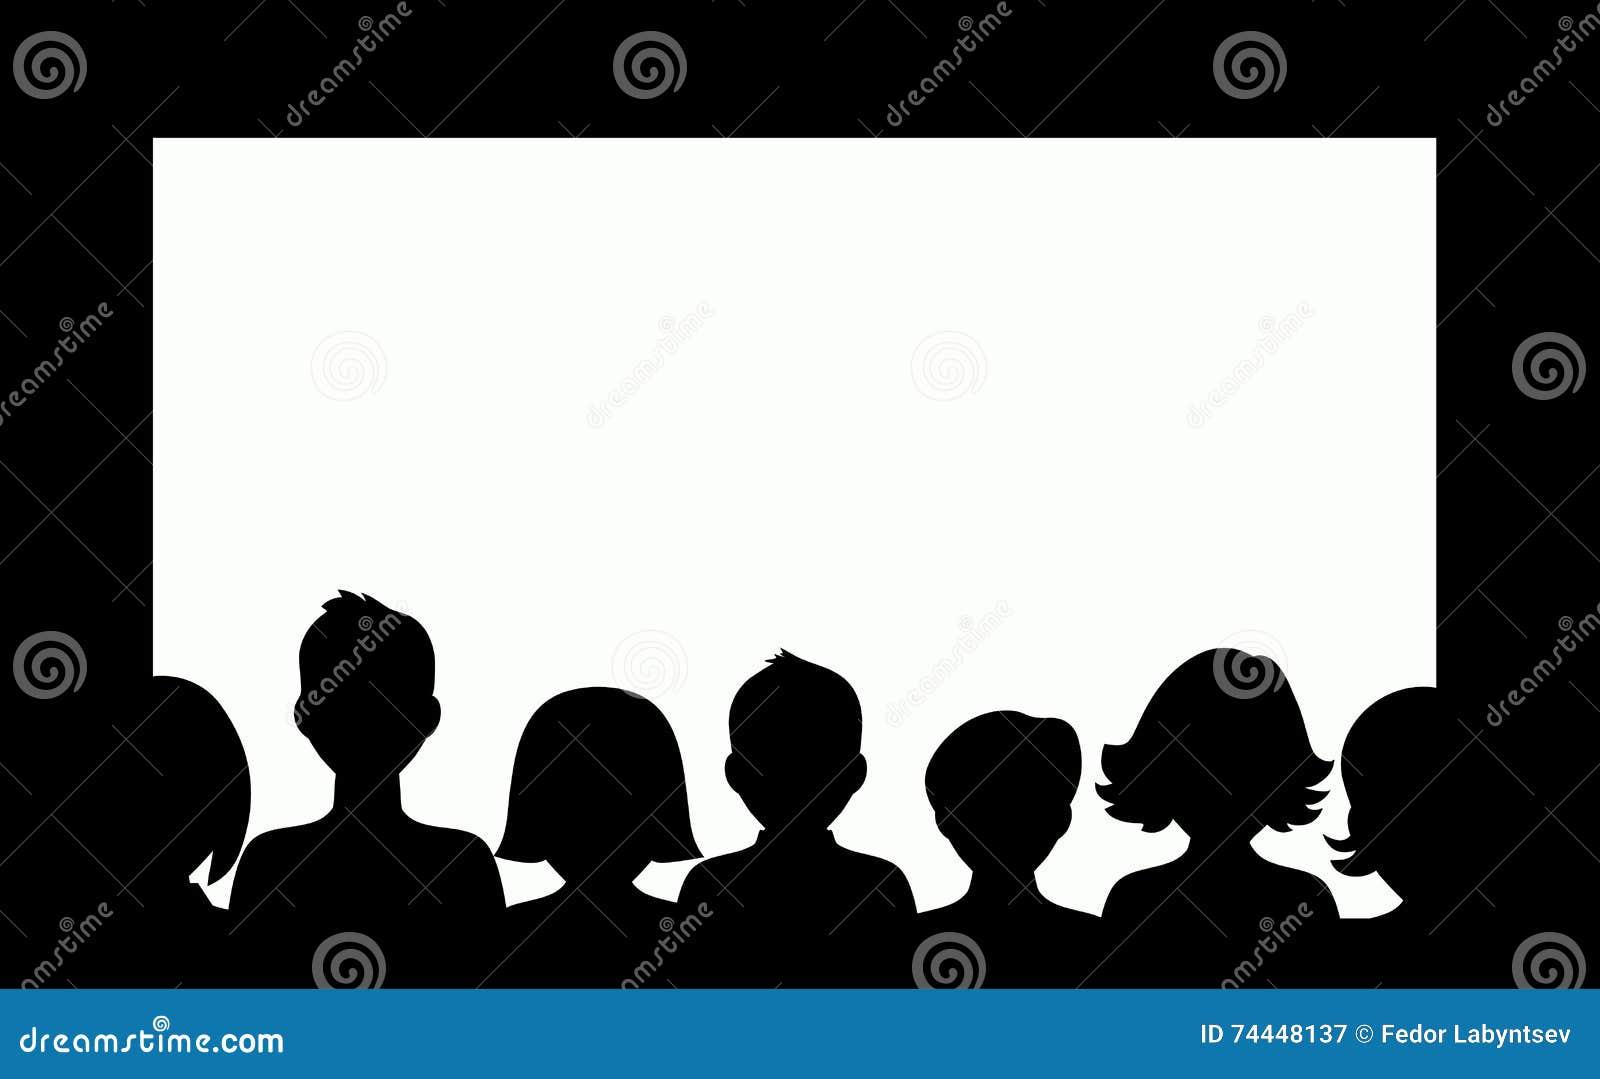 Movie Audience Silhouette | www.imgkid.com - The Image Kid ...